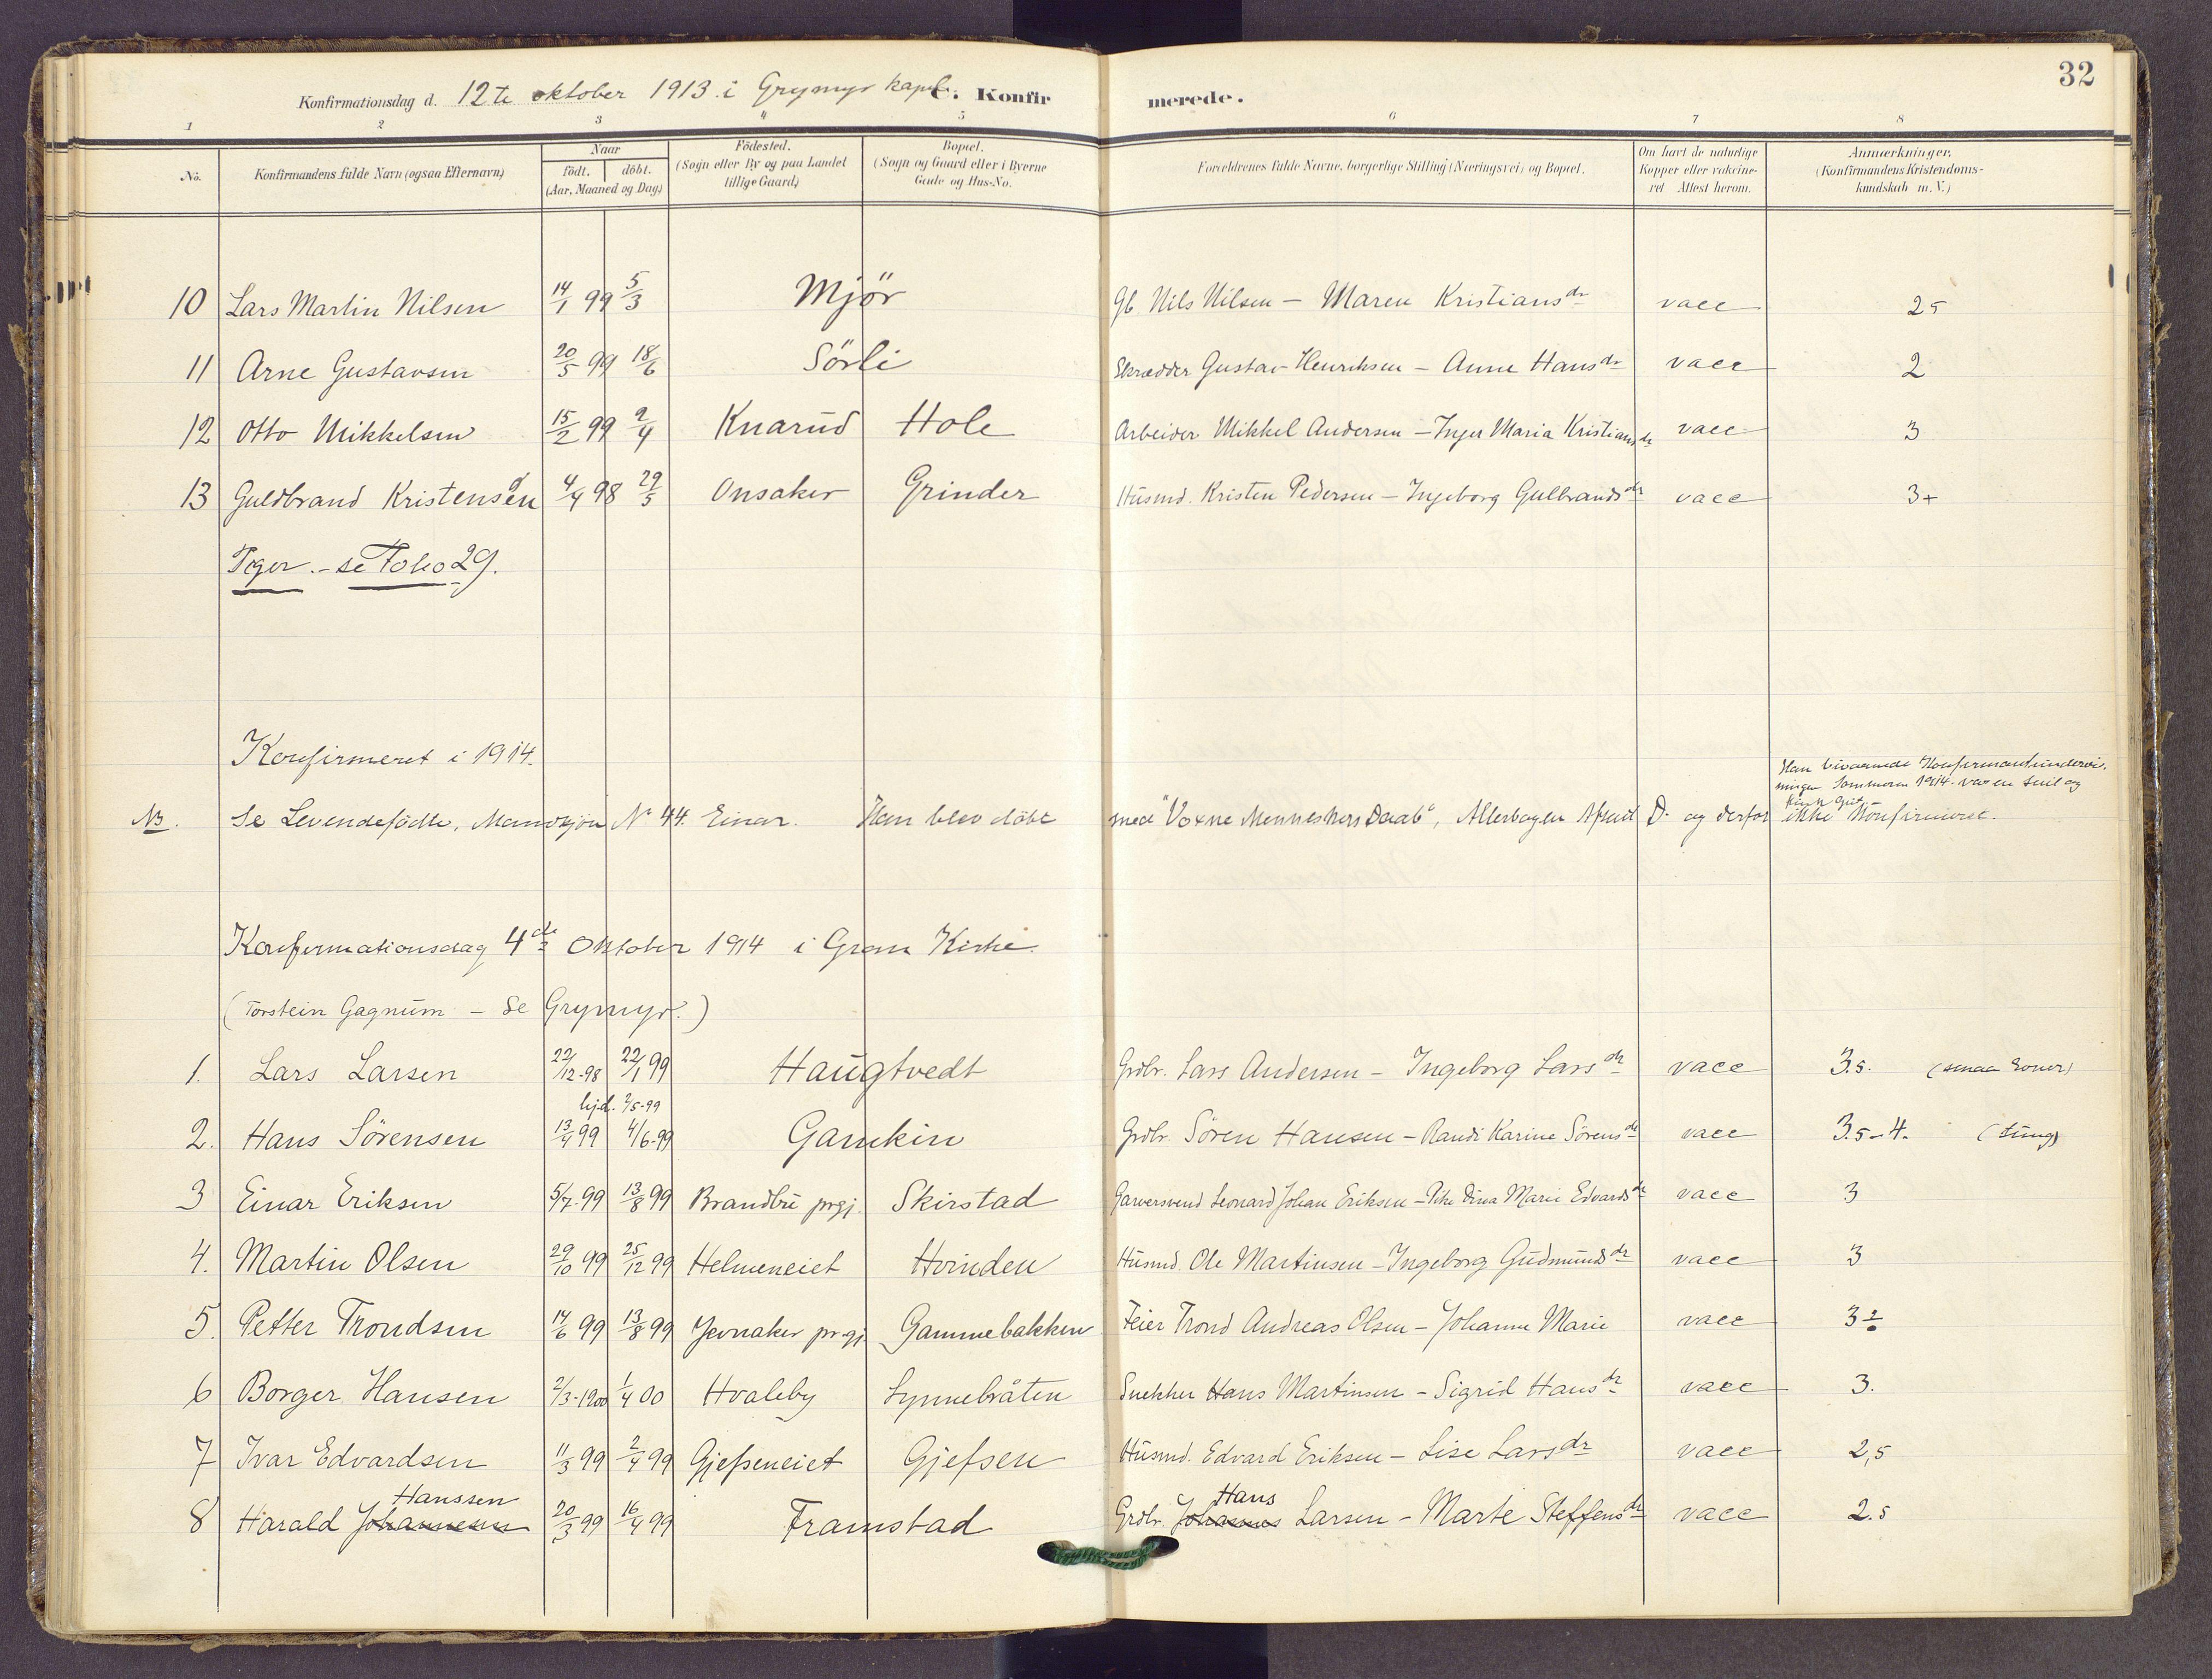 SAH, Gran prestekontor, Ministerialbok nr. 22, 1908-1918, s. 32